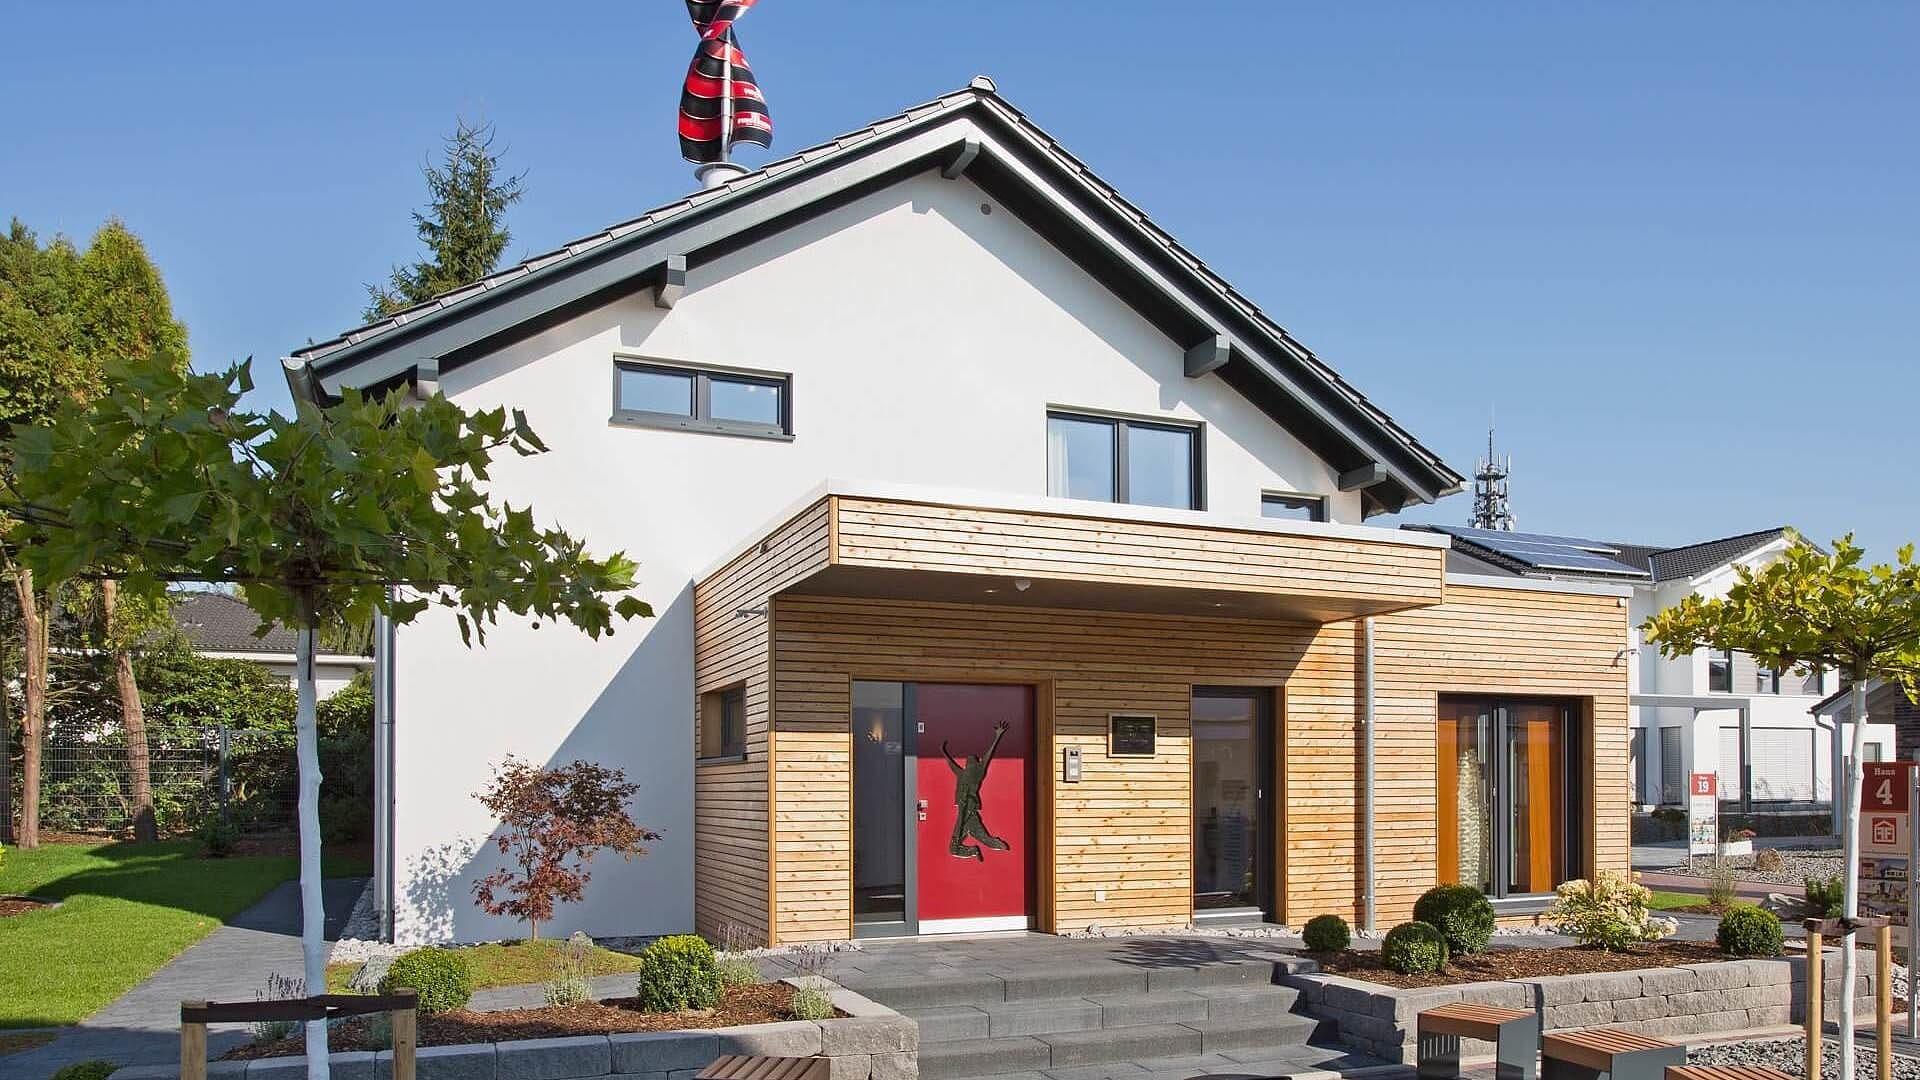 fingerhut haus musterhaus r in wuppertal. Black Bedroom Furniture Sets. Home Design Ideas